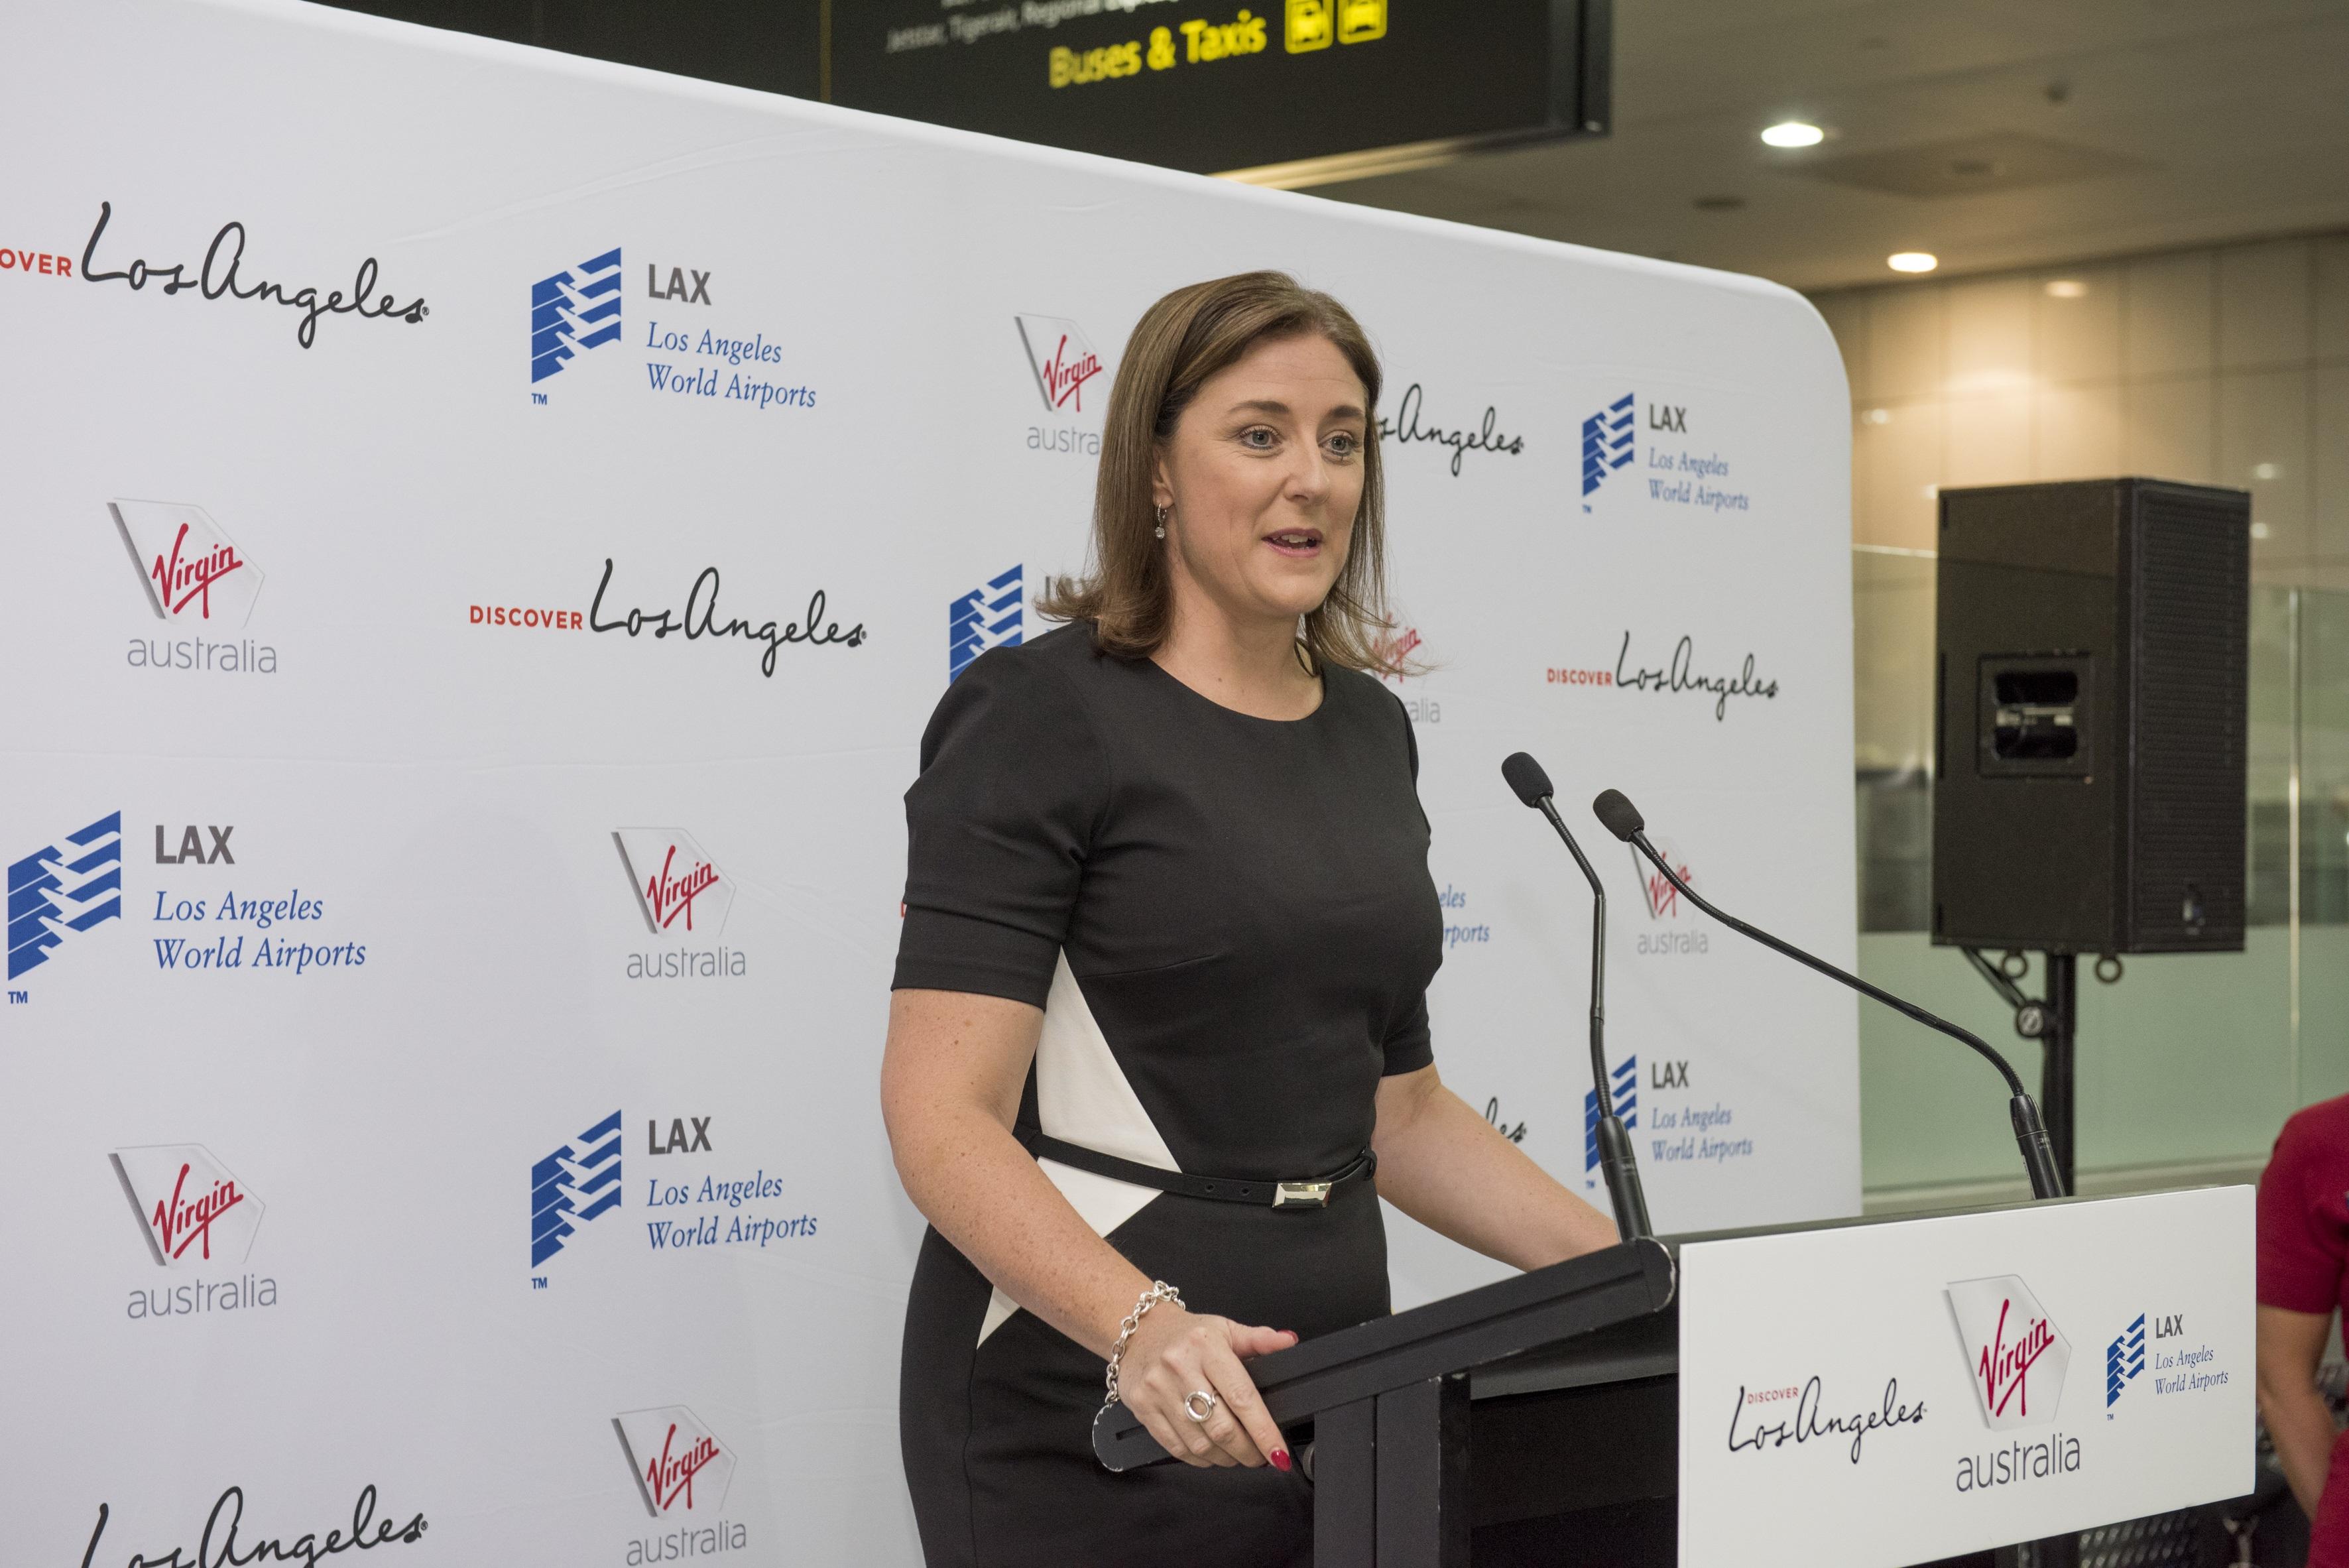 Delta, Virgin Australia strengthen trans-Pacific network with L.A.-Melbourne service